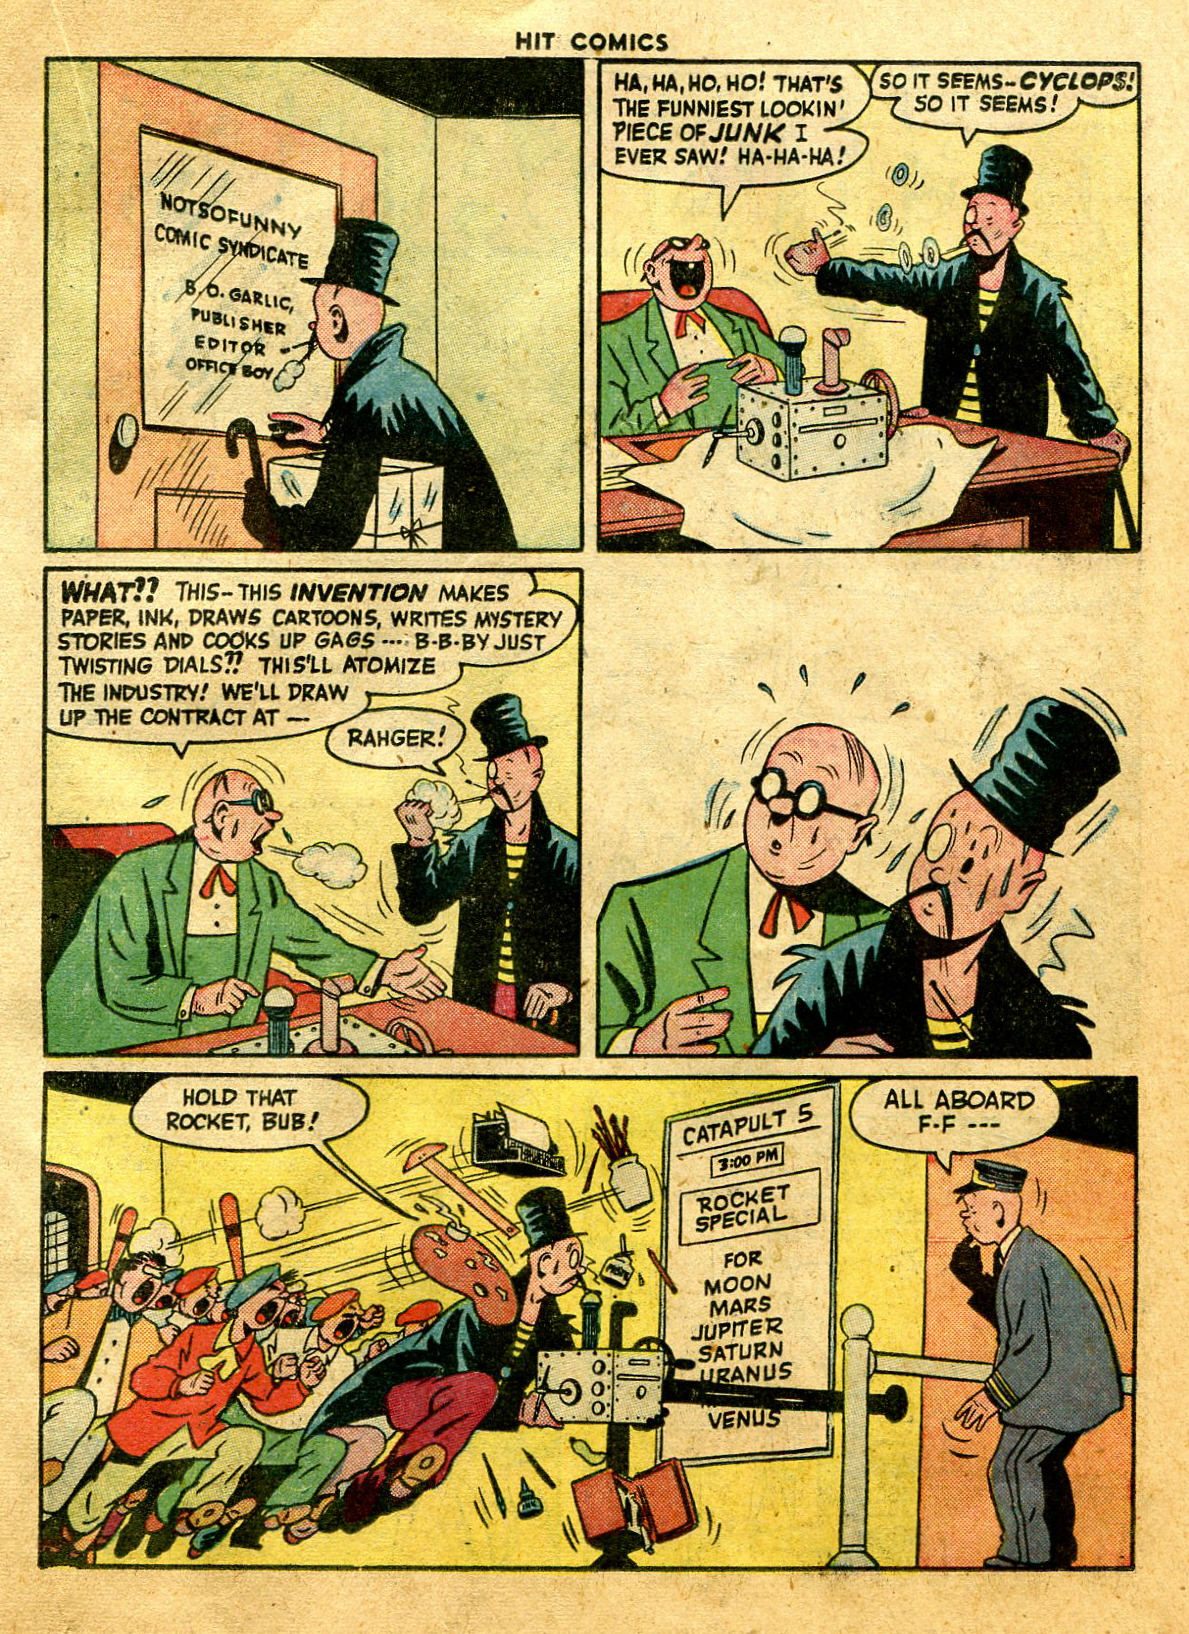 Read online Hit Comics comic -  Issue #44 - 29